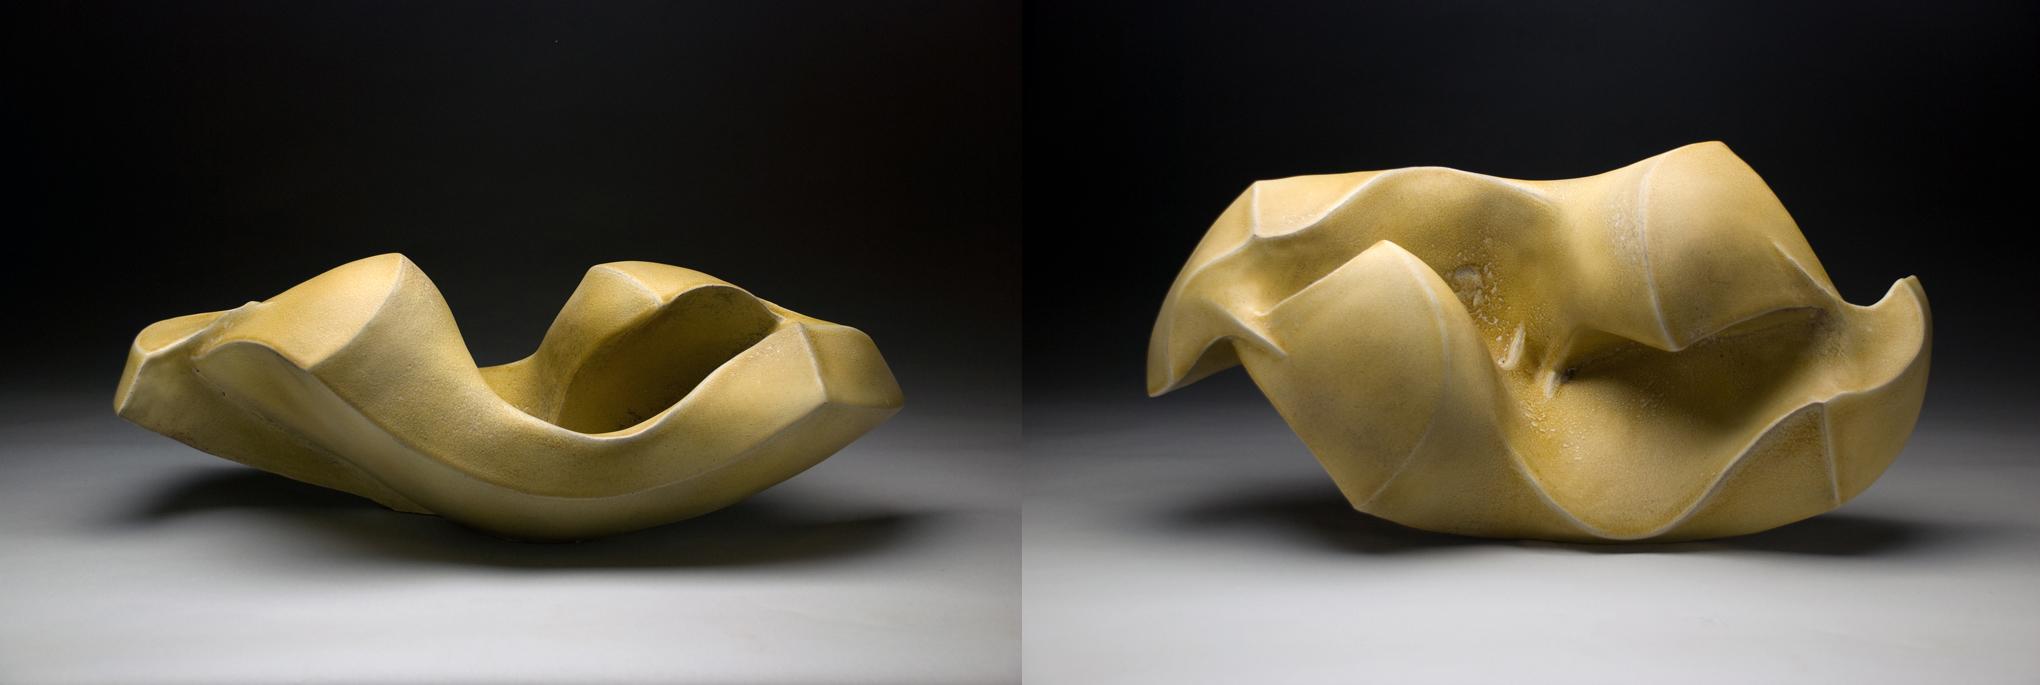 Shift Series (Amber), 2012